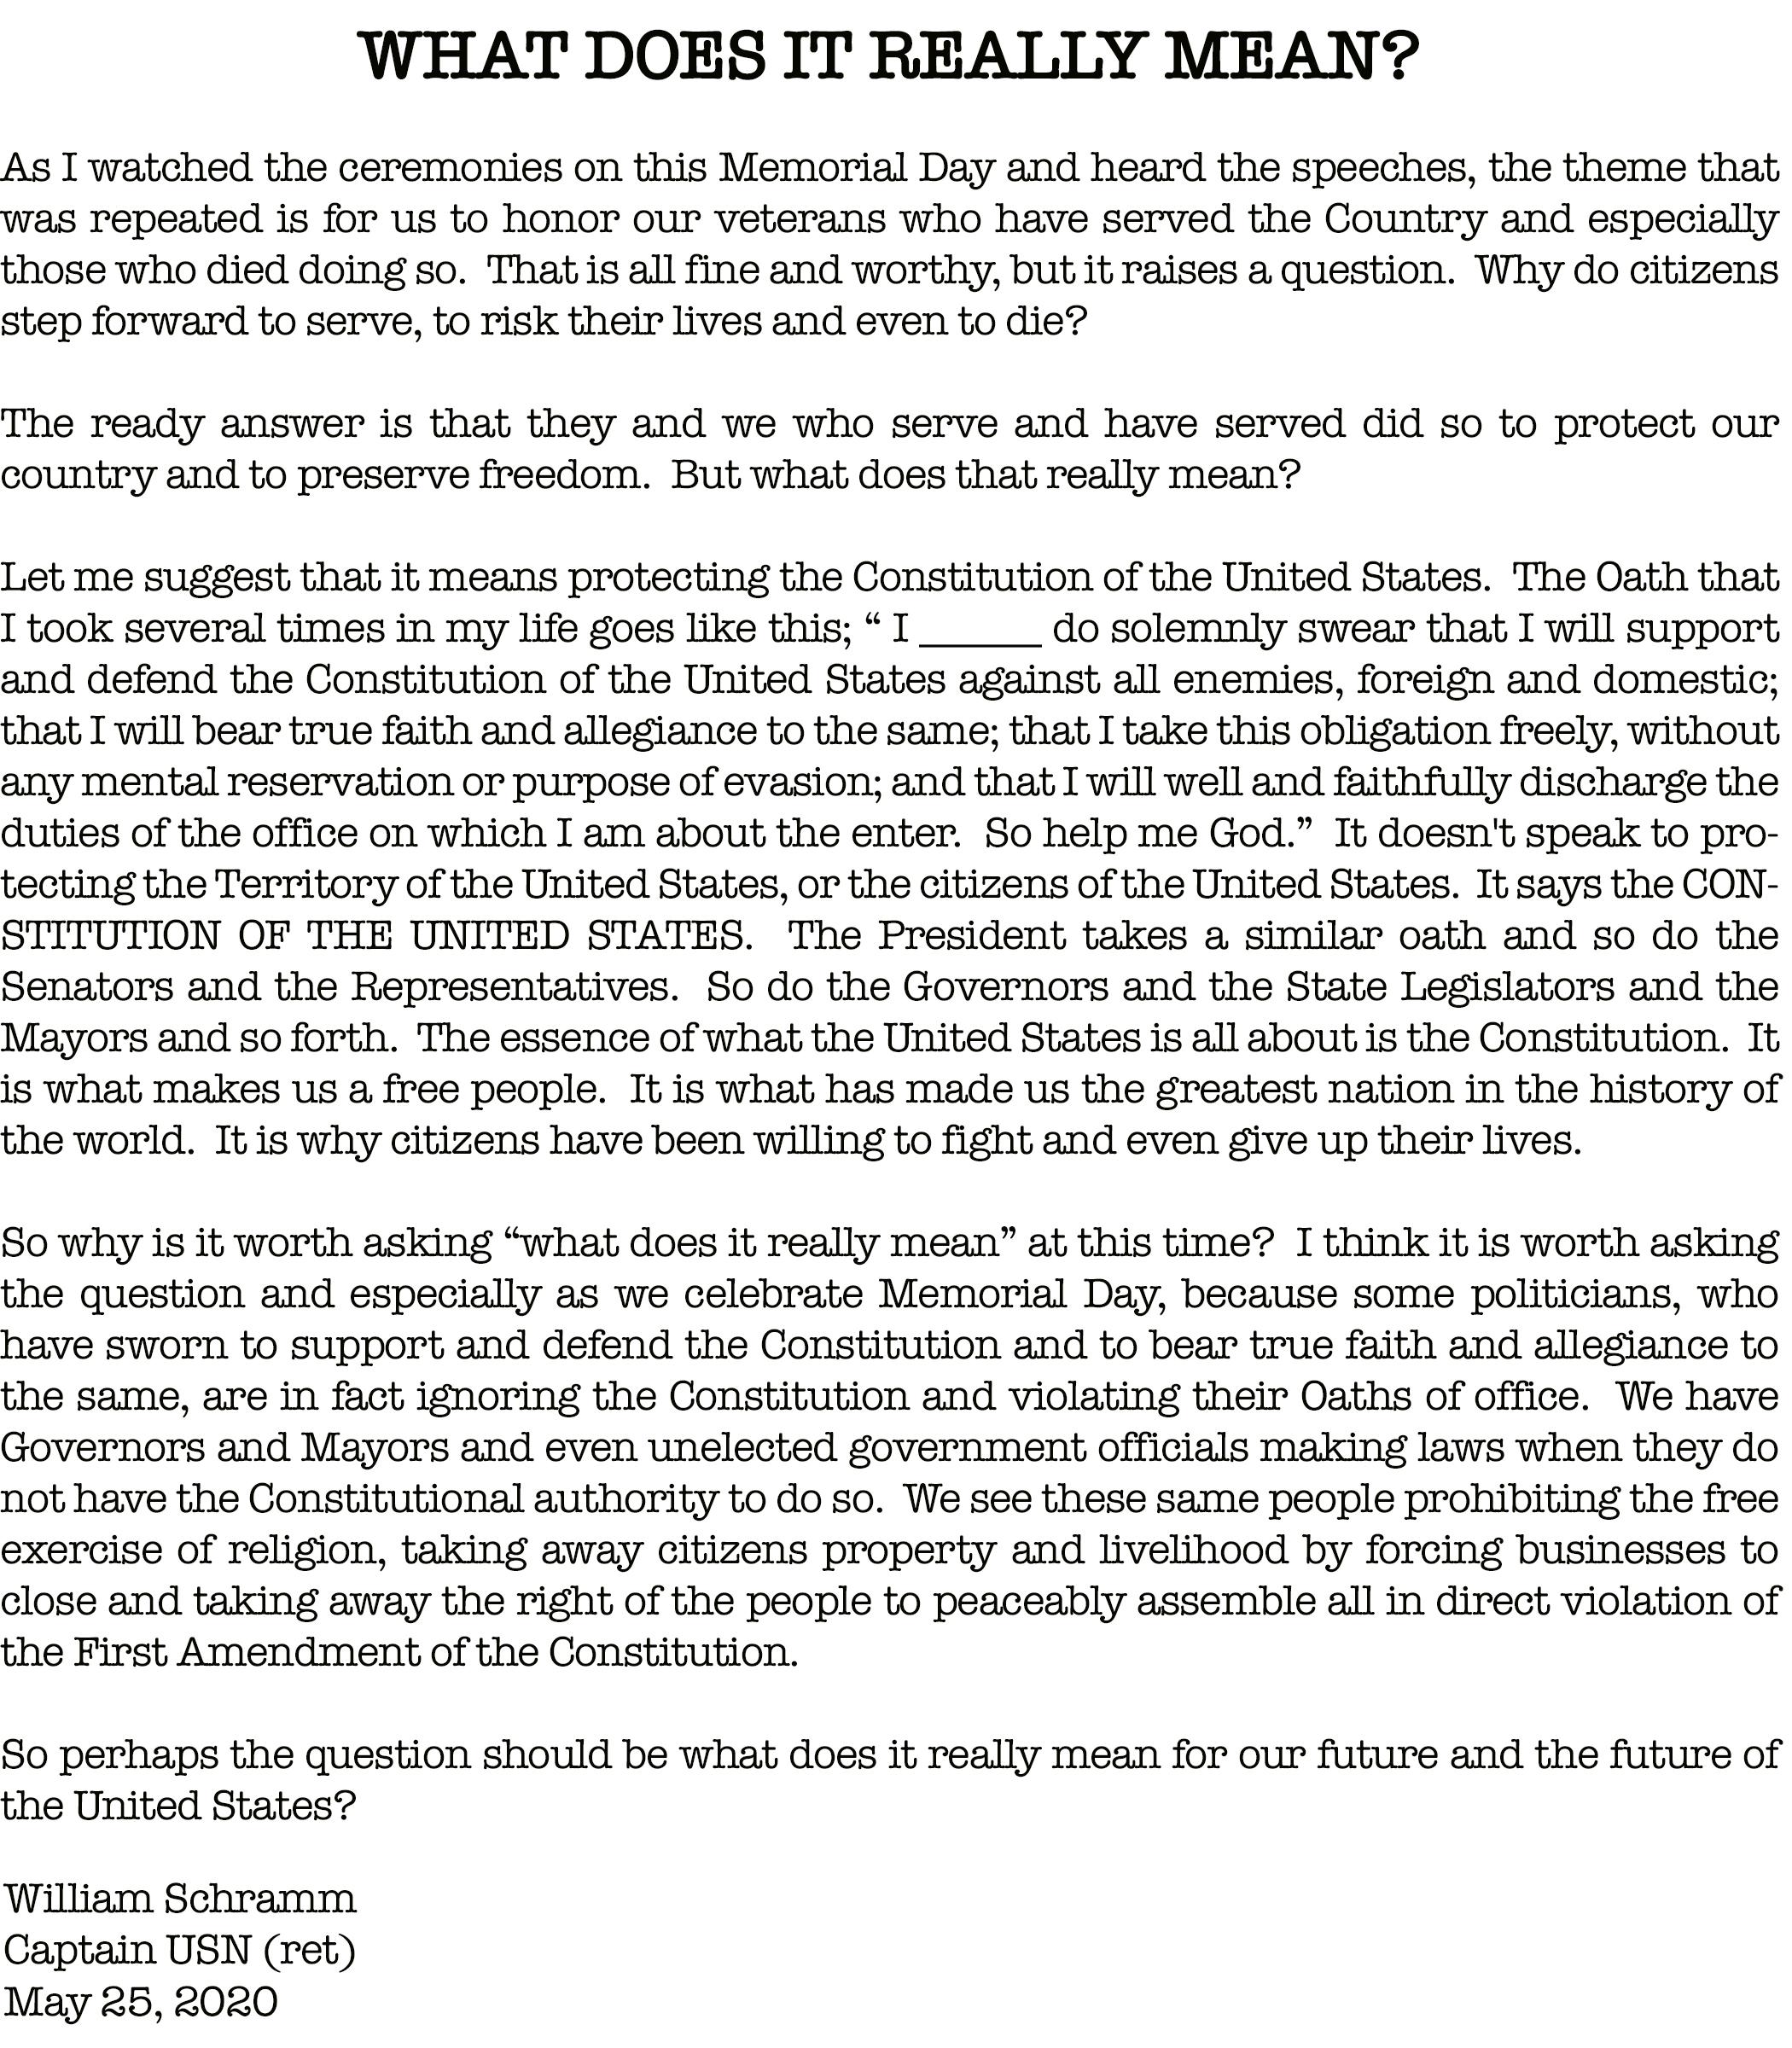 Bill Schramm Memorial Day Letter